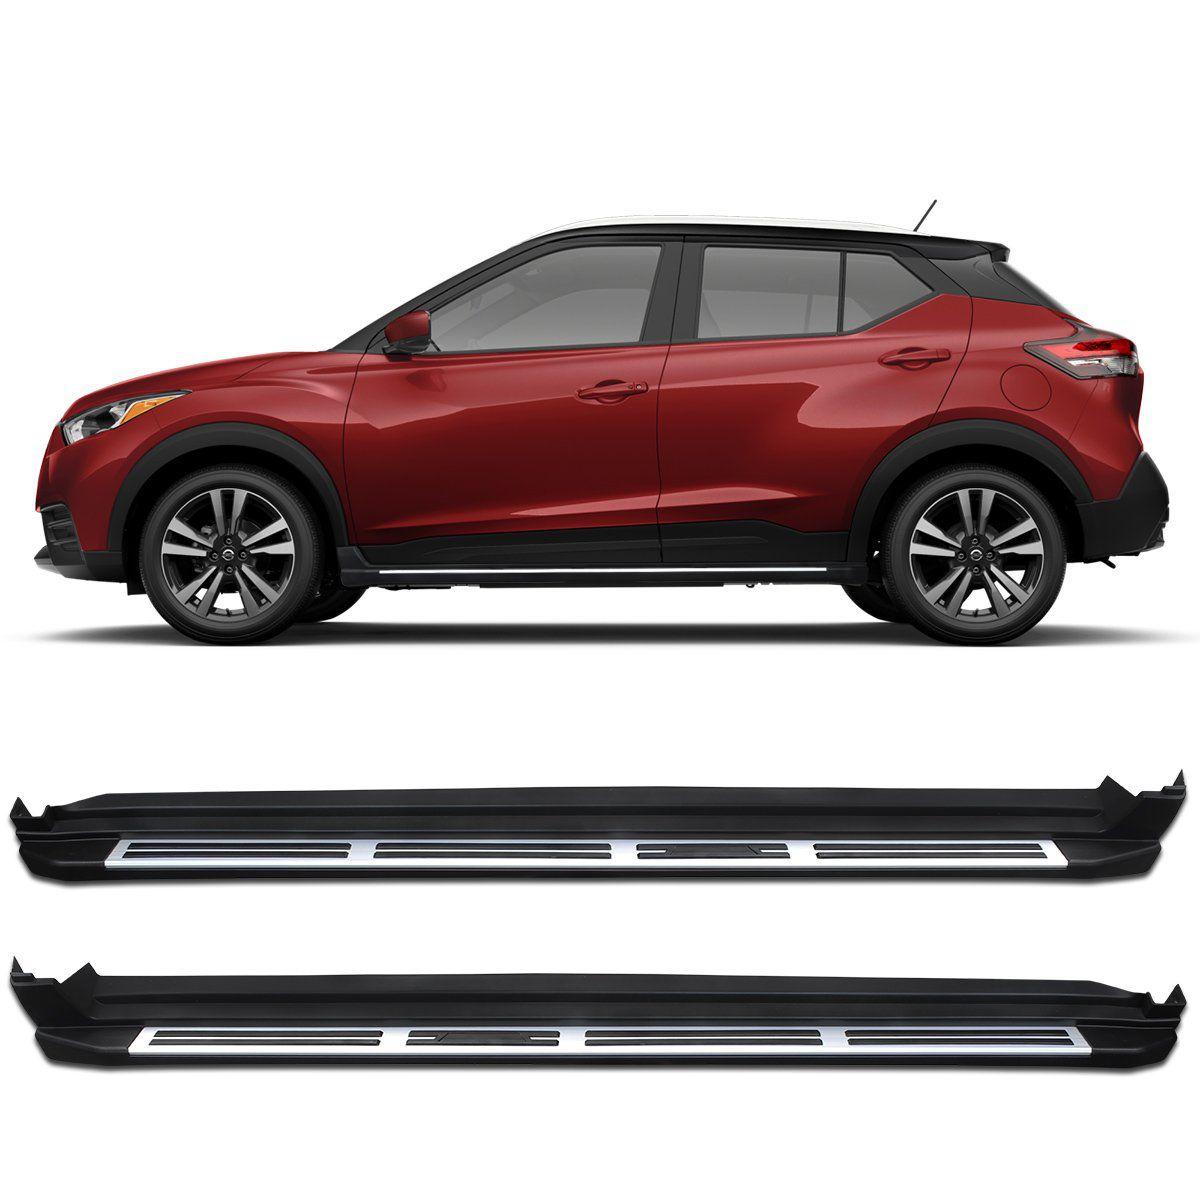 Estribo Lateral Nissan Kicks 2017 a 2019 Preto Modelo Original